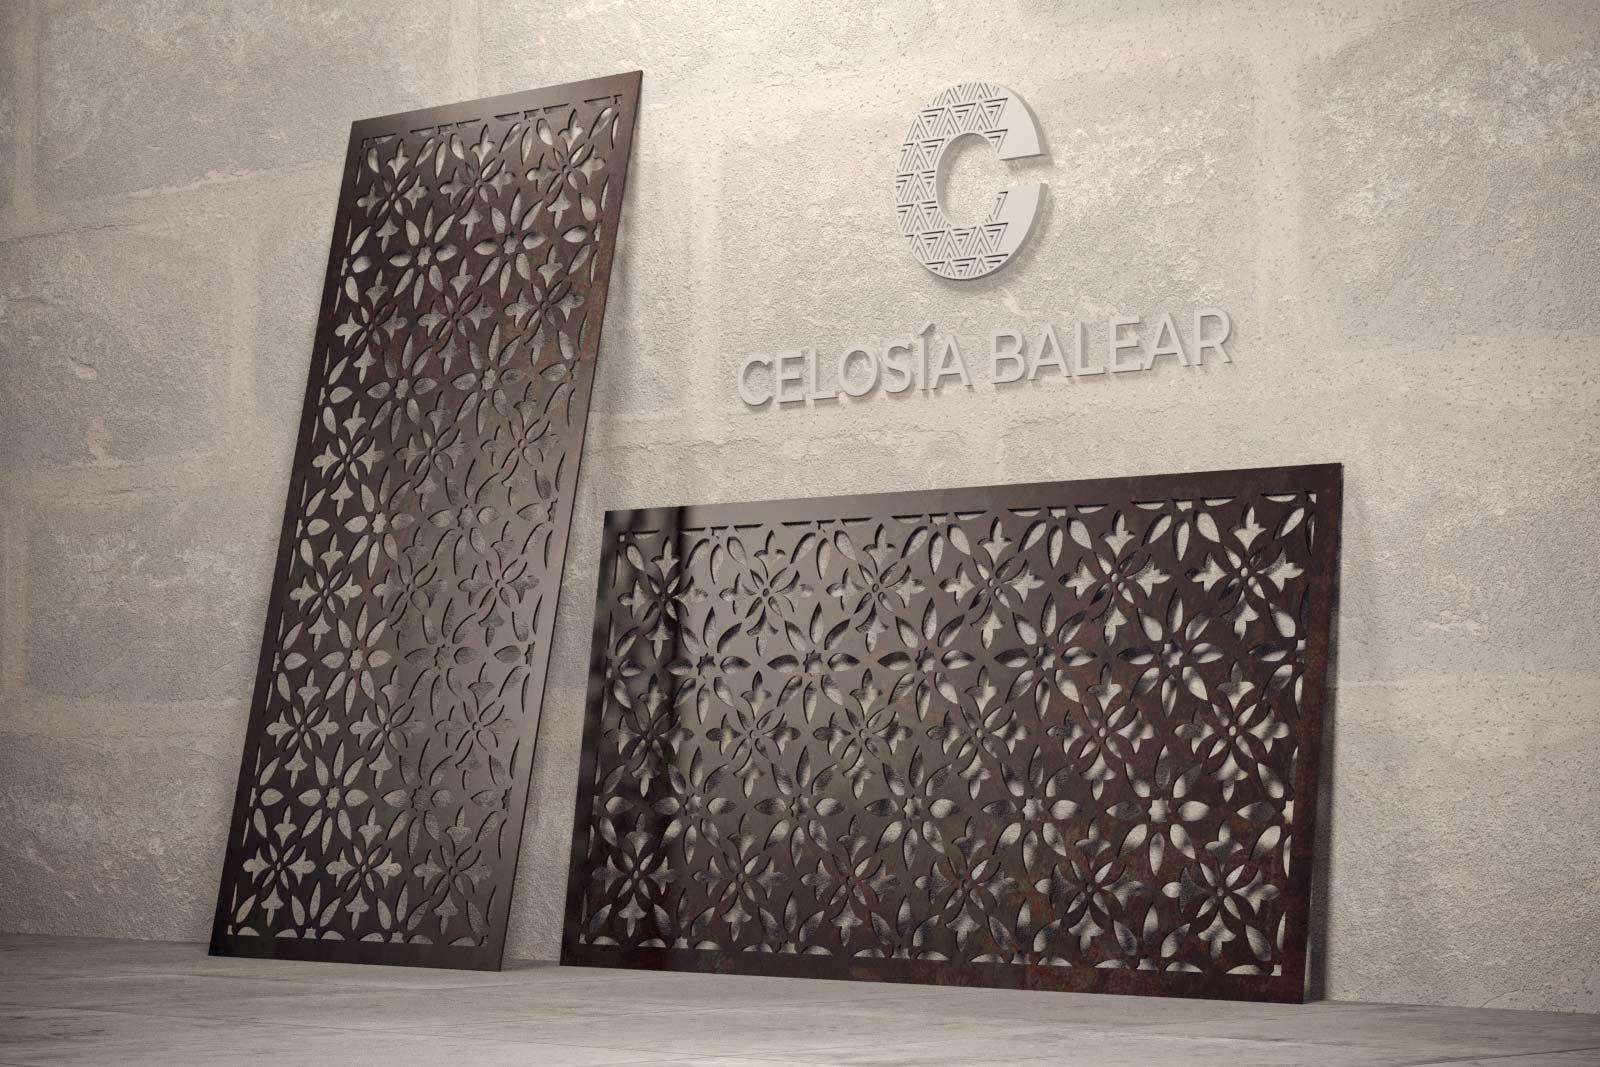 Celosía Balear enseña su placa con diseño natural